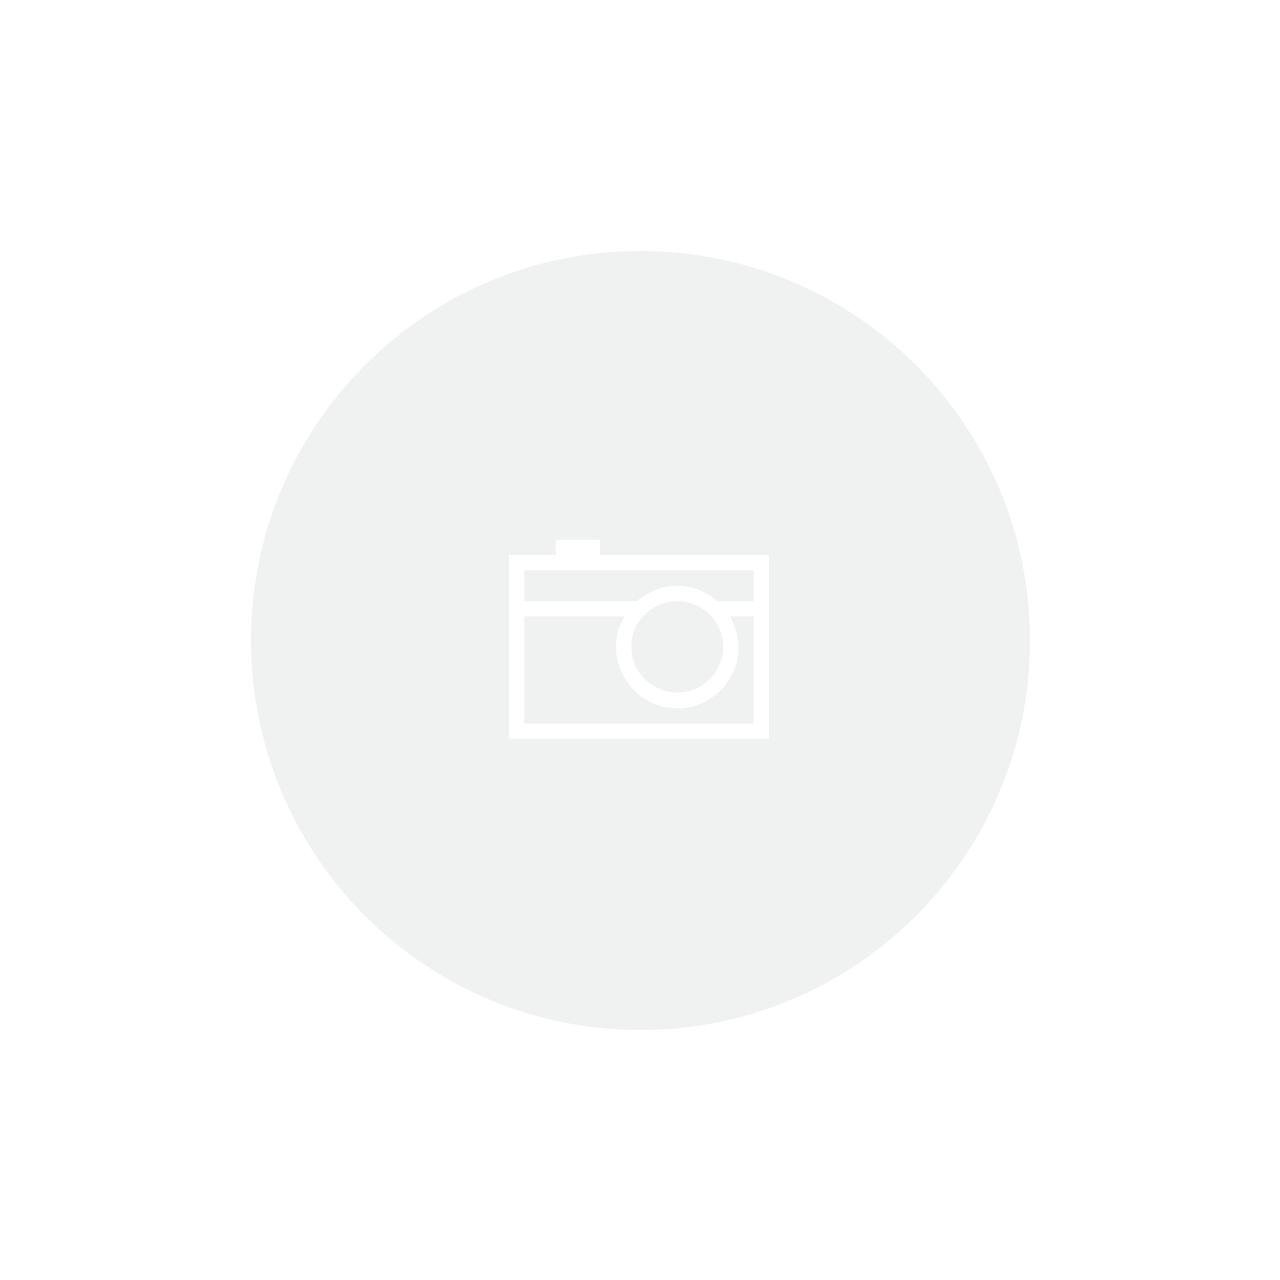 VISTA LIGHT TRIANGULAR RECARREGÁVEL USB (H-1311)